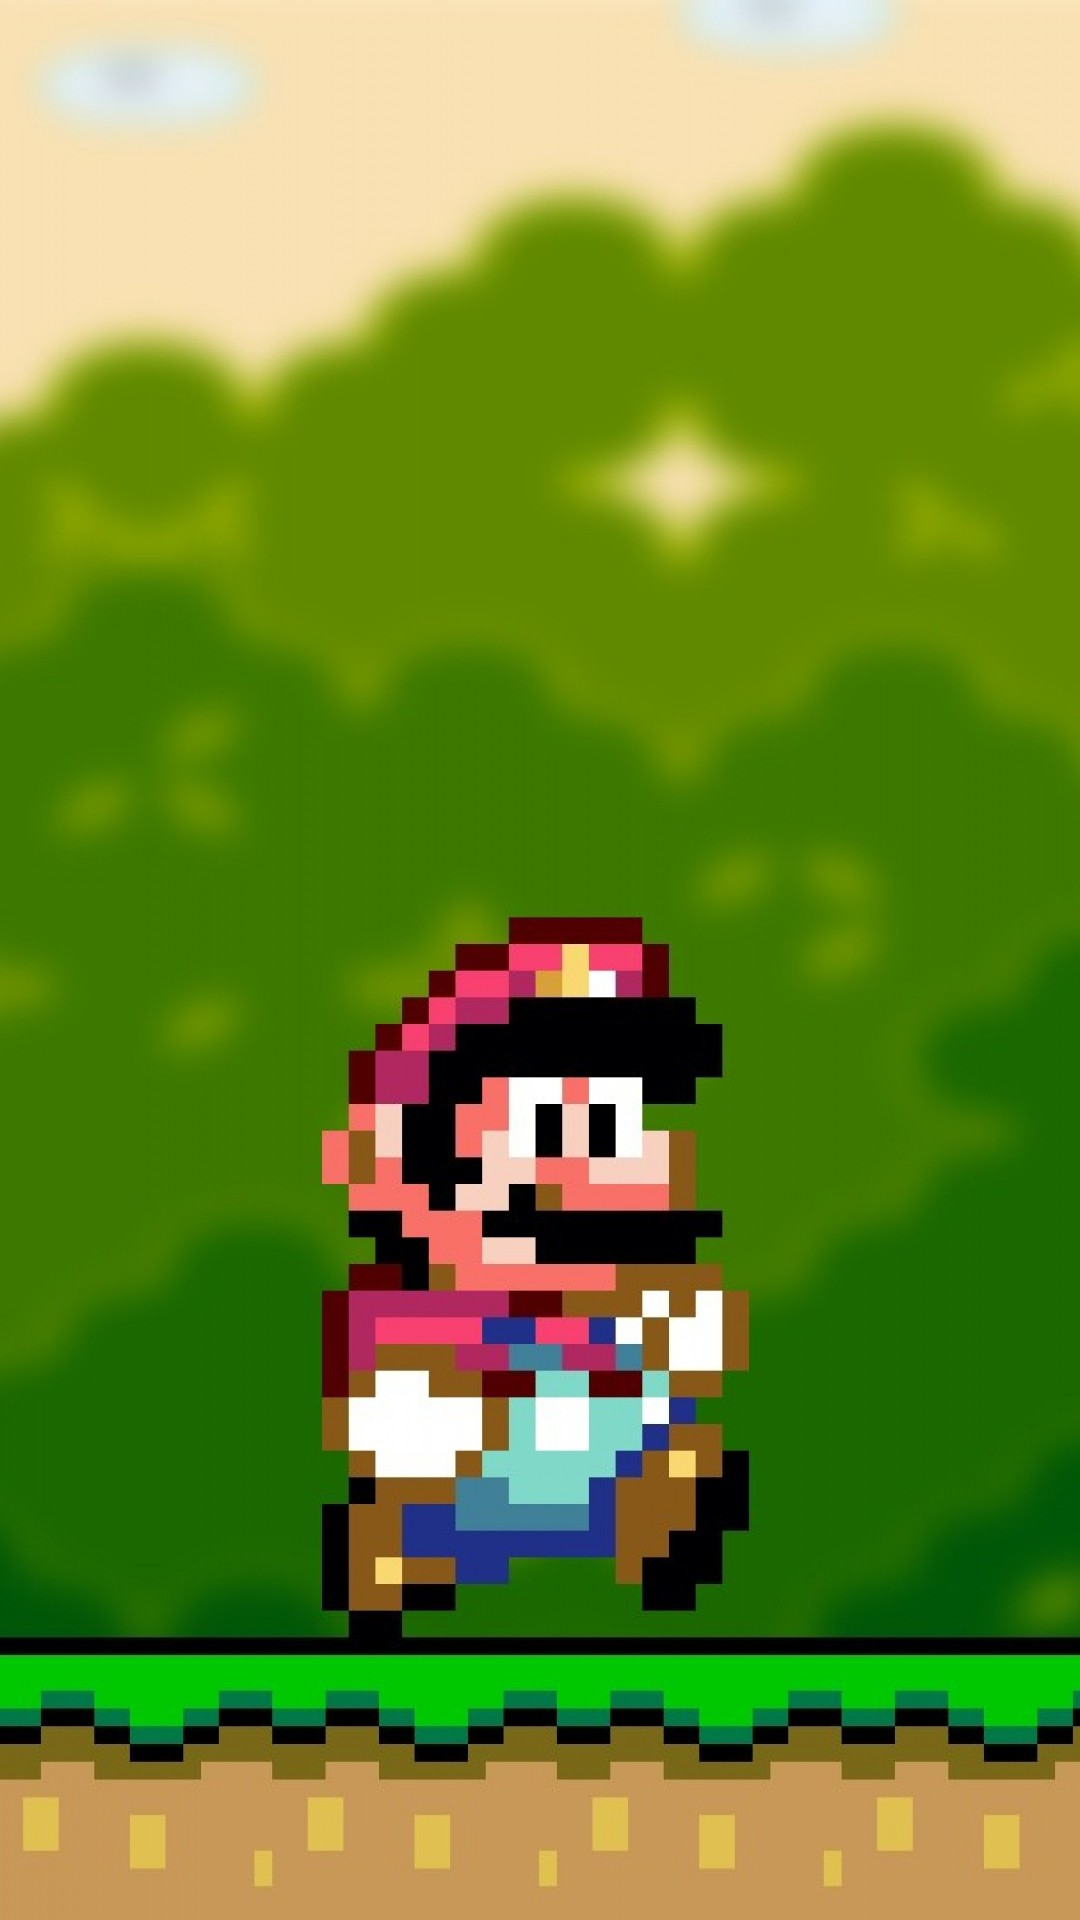 Explore Mario Brothers, Super Mario Bros, and more!